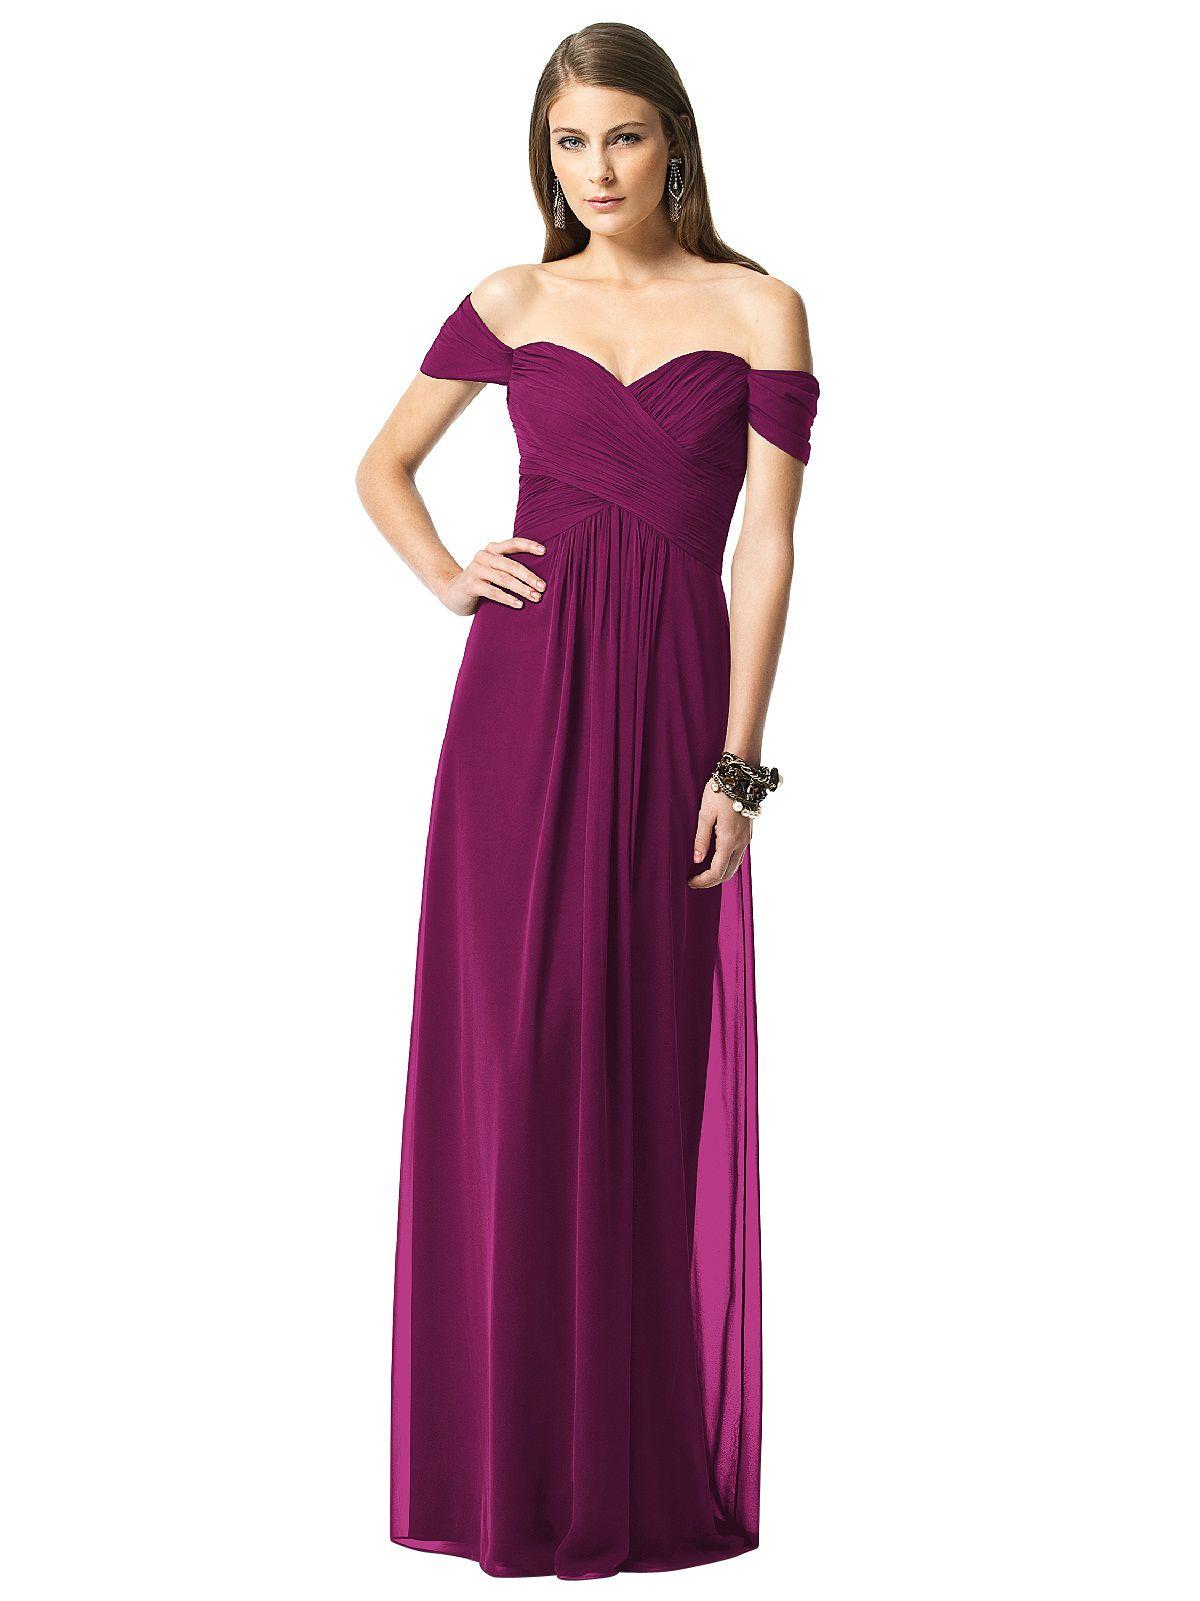 Dessy 2844 Bridesmaid Dress   Weddington Way   Miss to Mrs   Pinterest